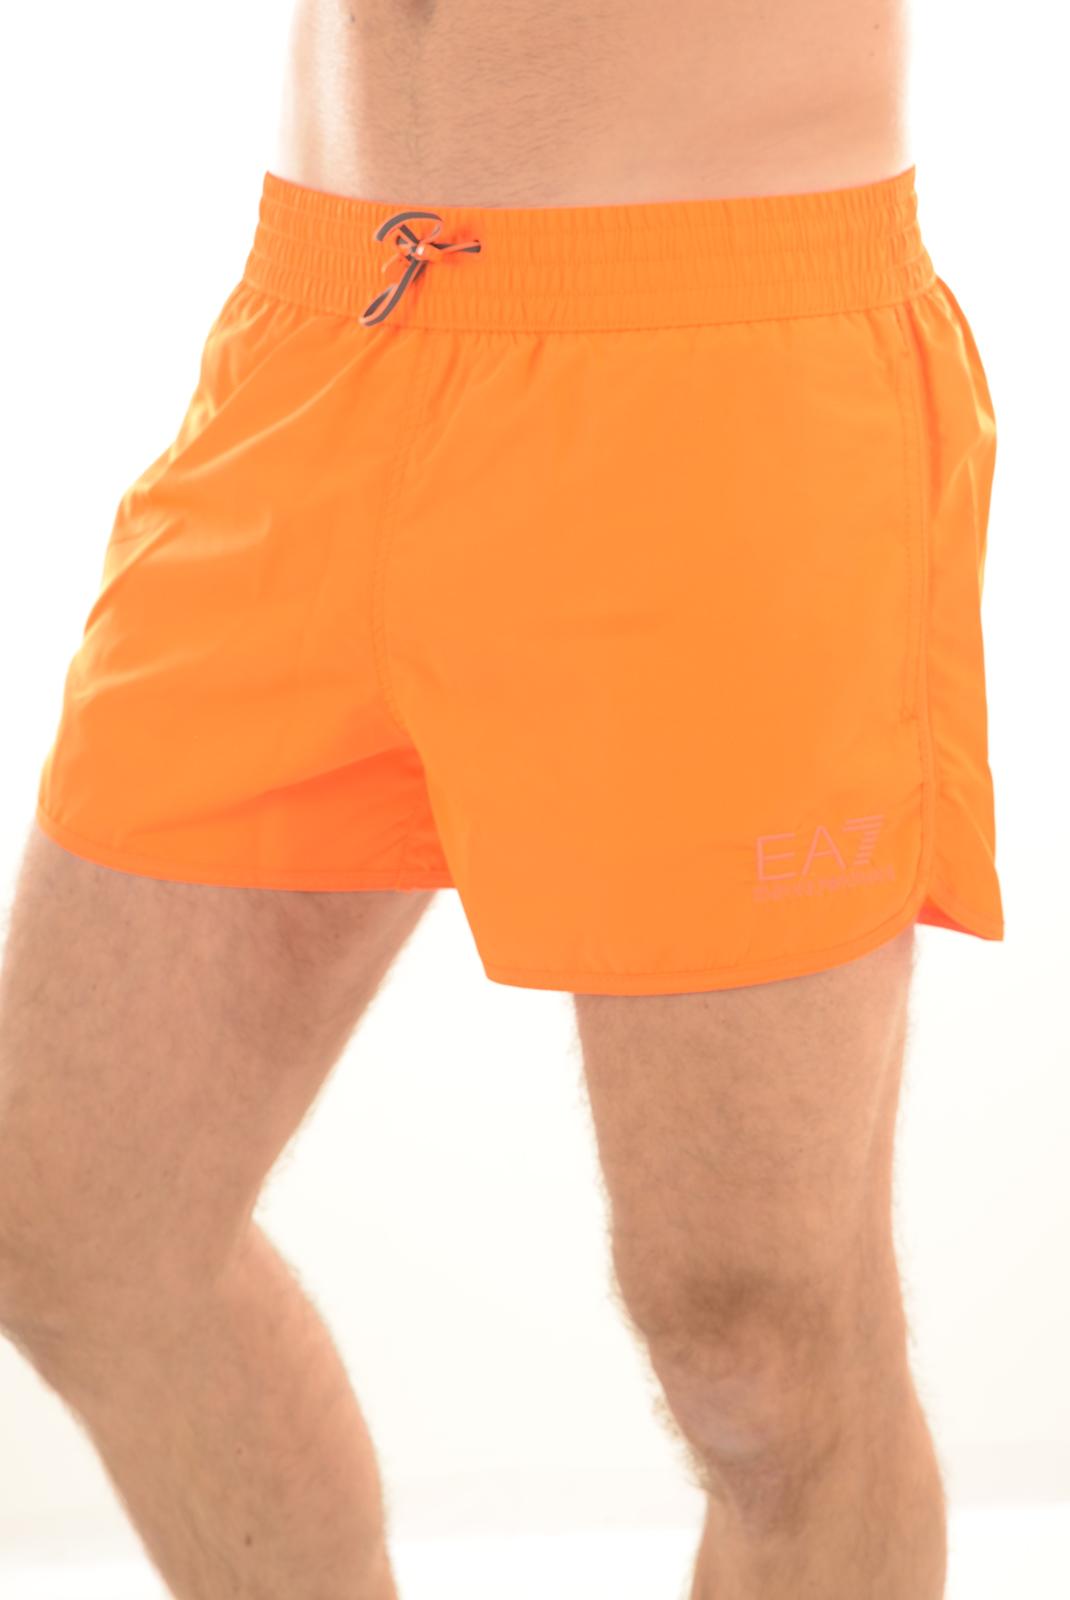 Shorts de bain  Emporio armani 902007 6P740 ORANGE 662